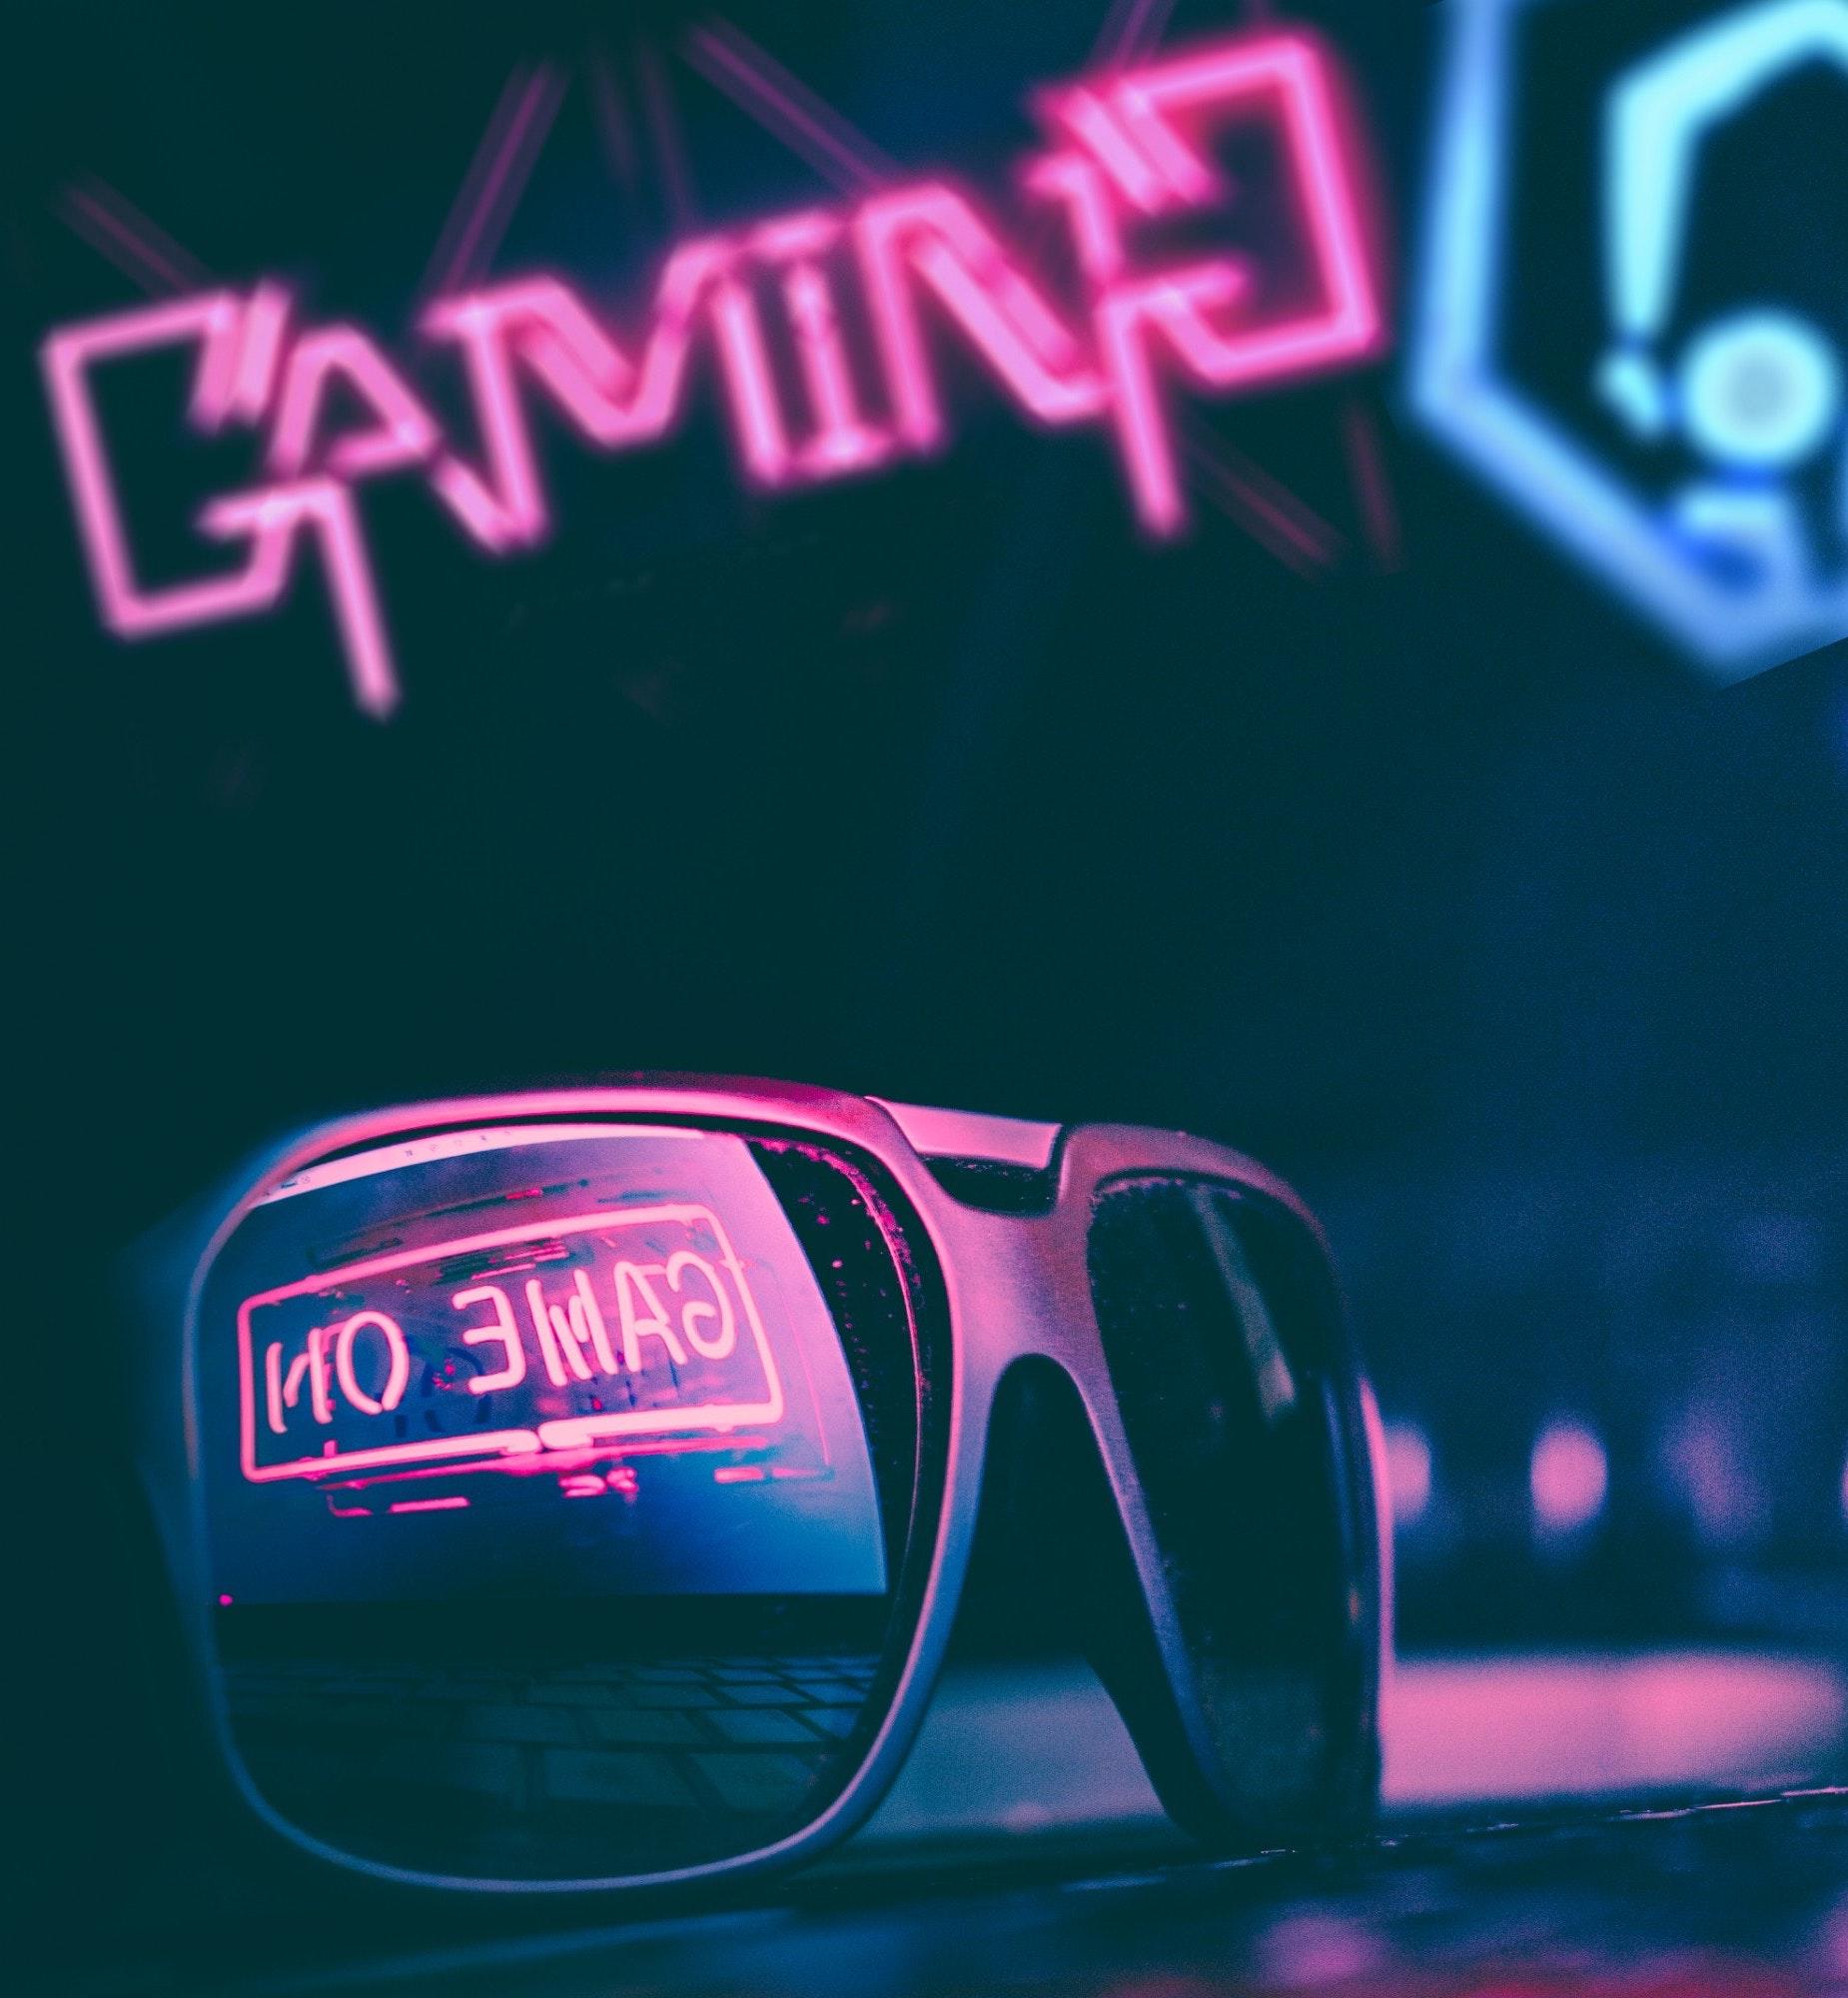 Trendy sunglasses reflecting neon light sign in dark room